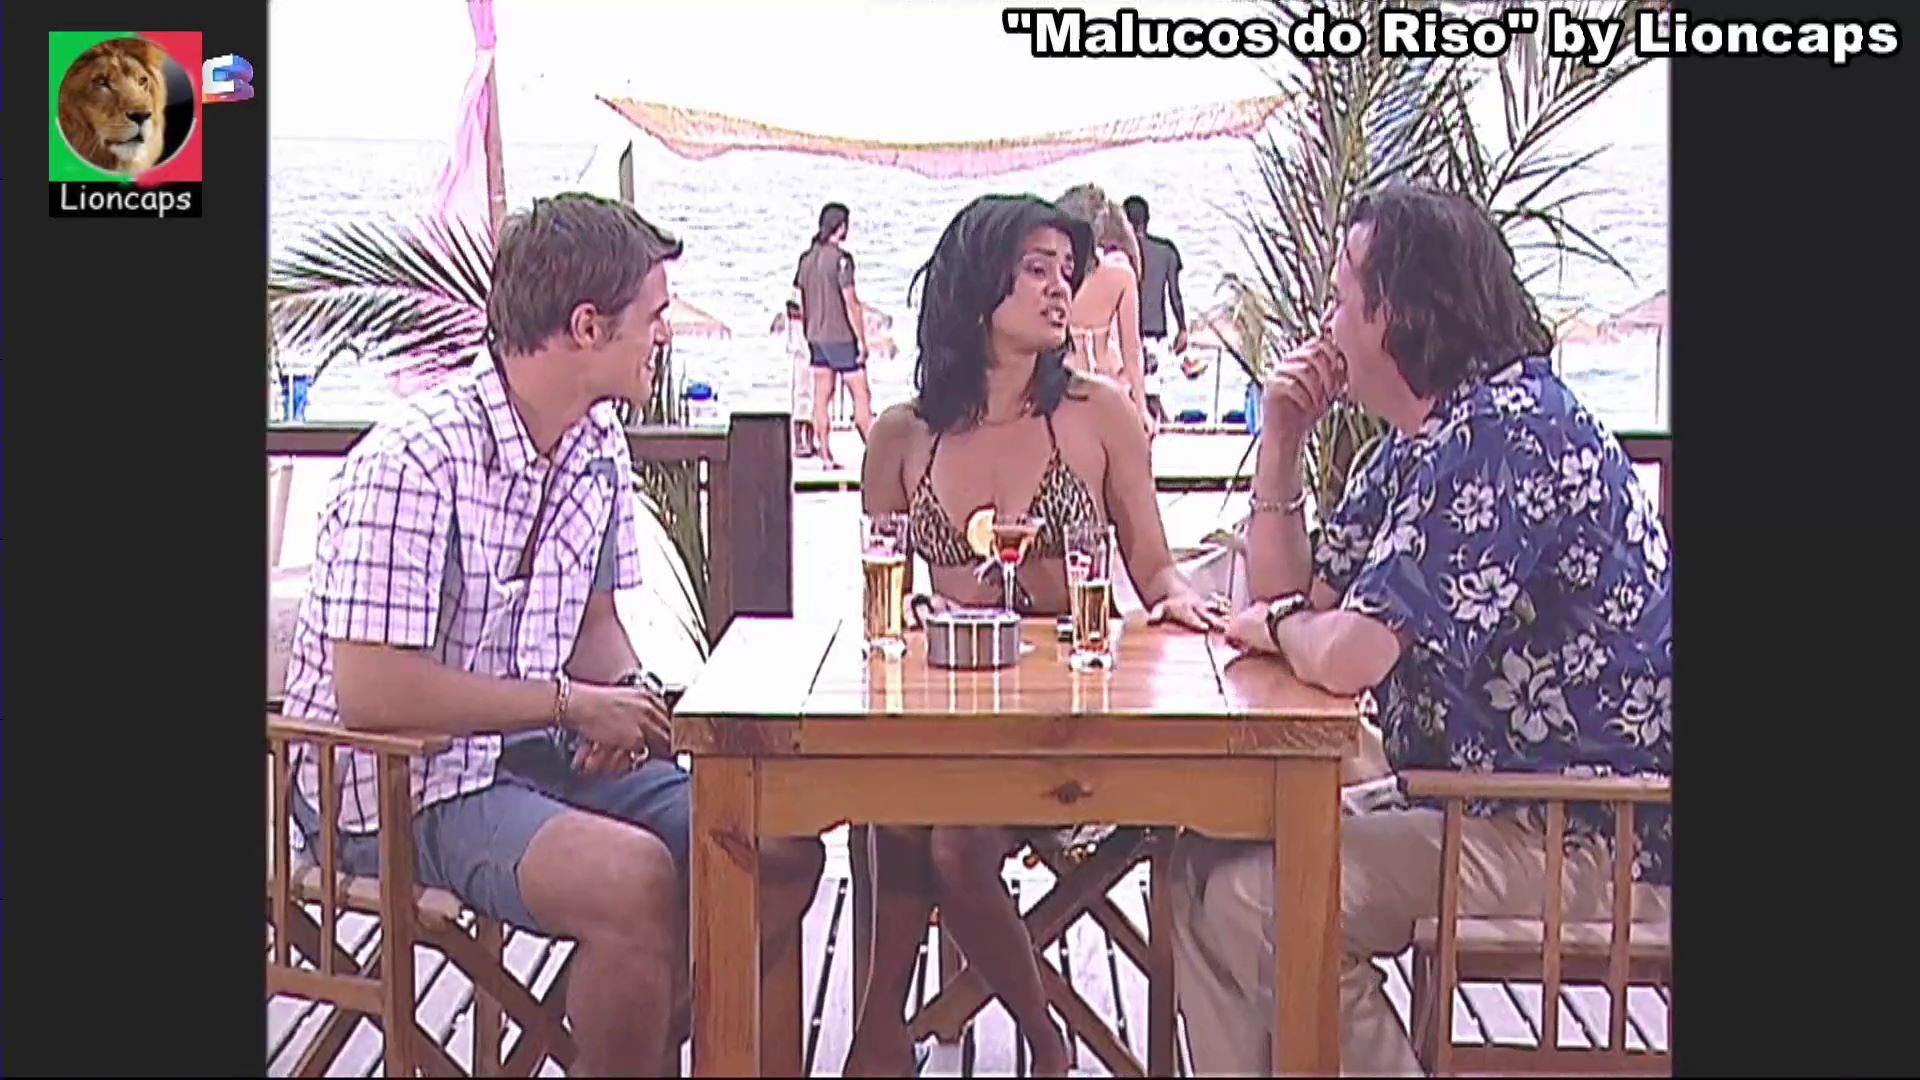 475088583_malucos_riso_alda_gomes_vs190malucos_riso_602_15023_122_573lo.JPG